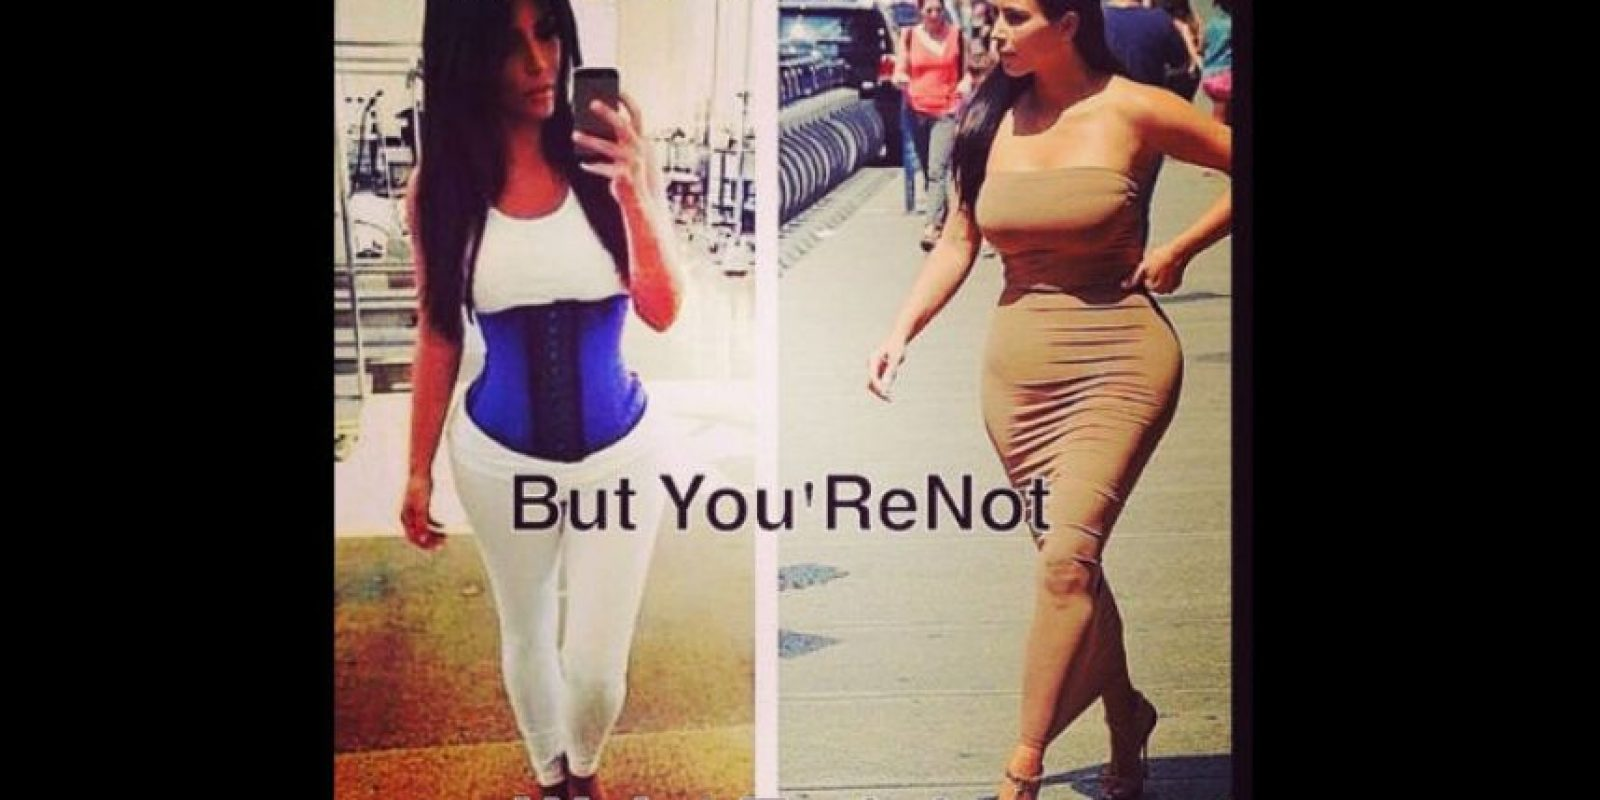 Al parecer esta prenda también ayudó a Kim Kardashian. Foto:Instagram/premadonna87